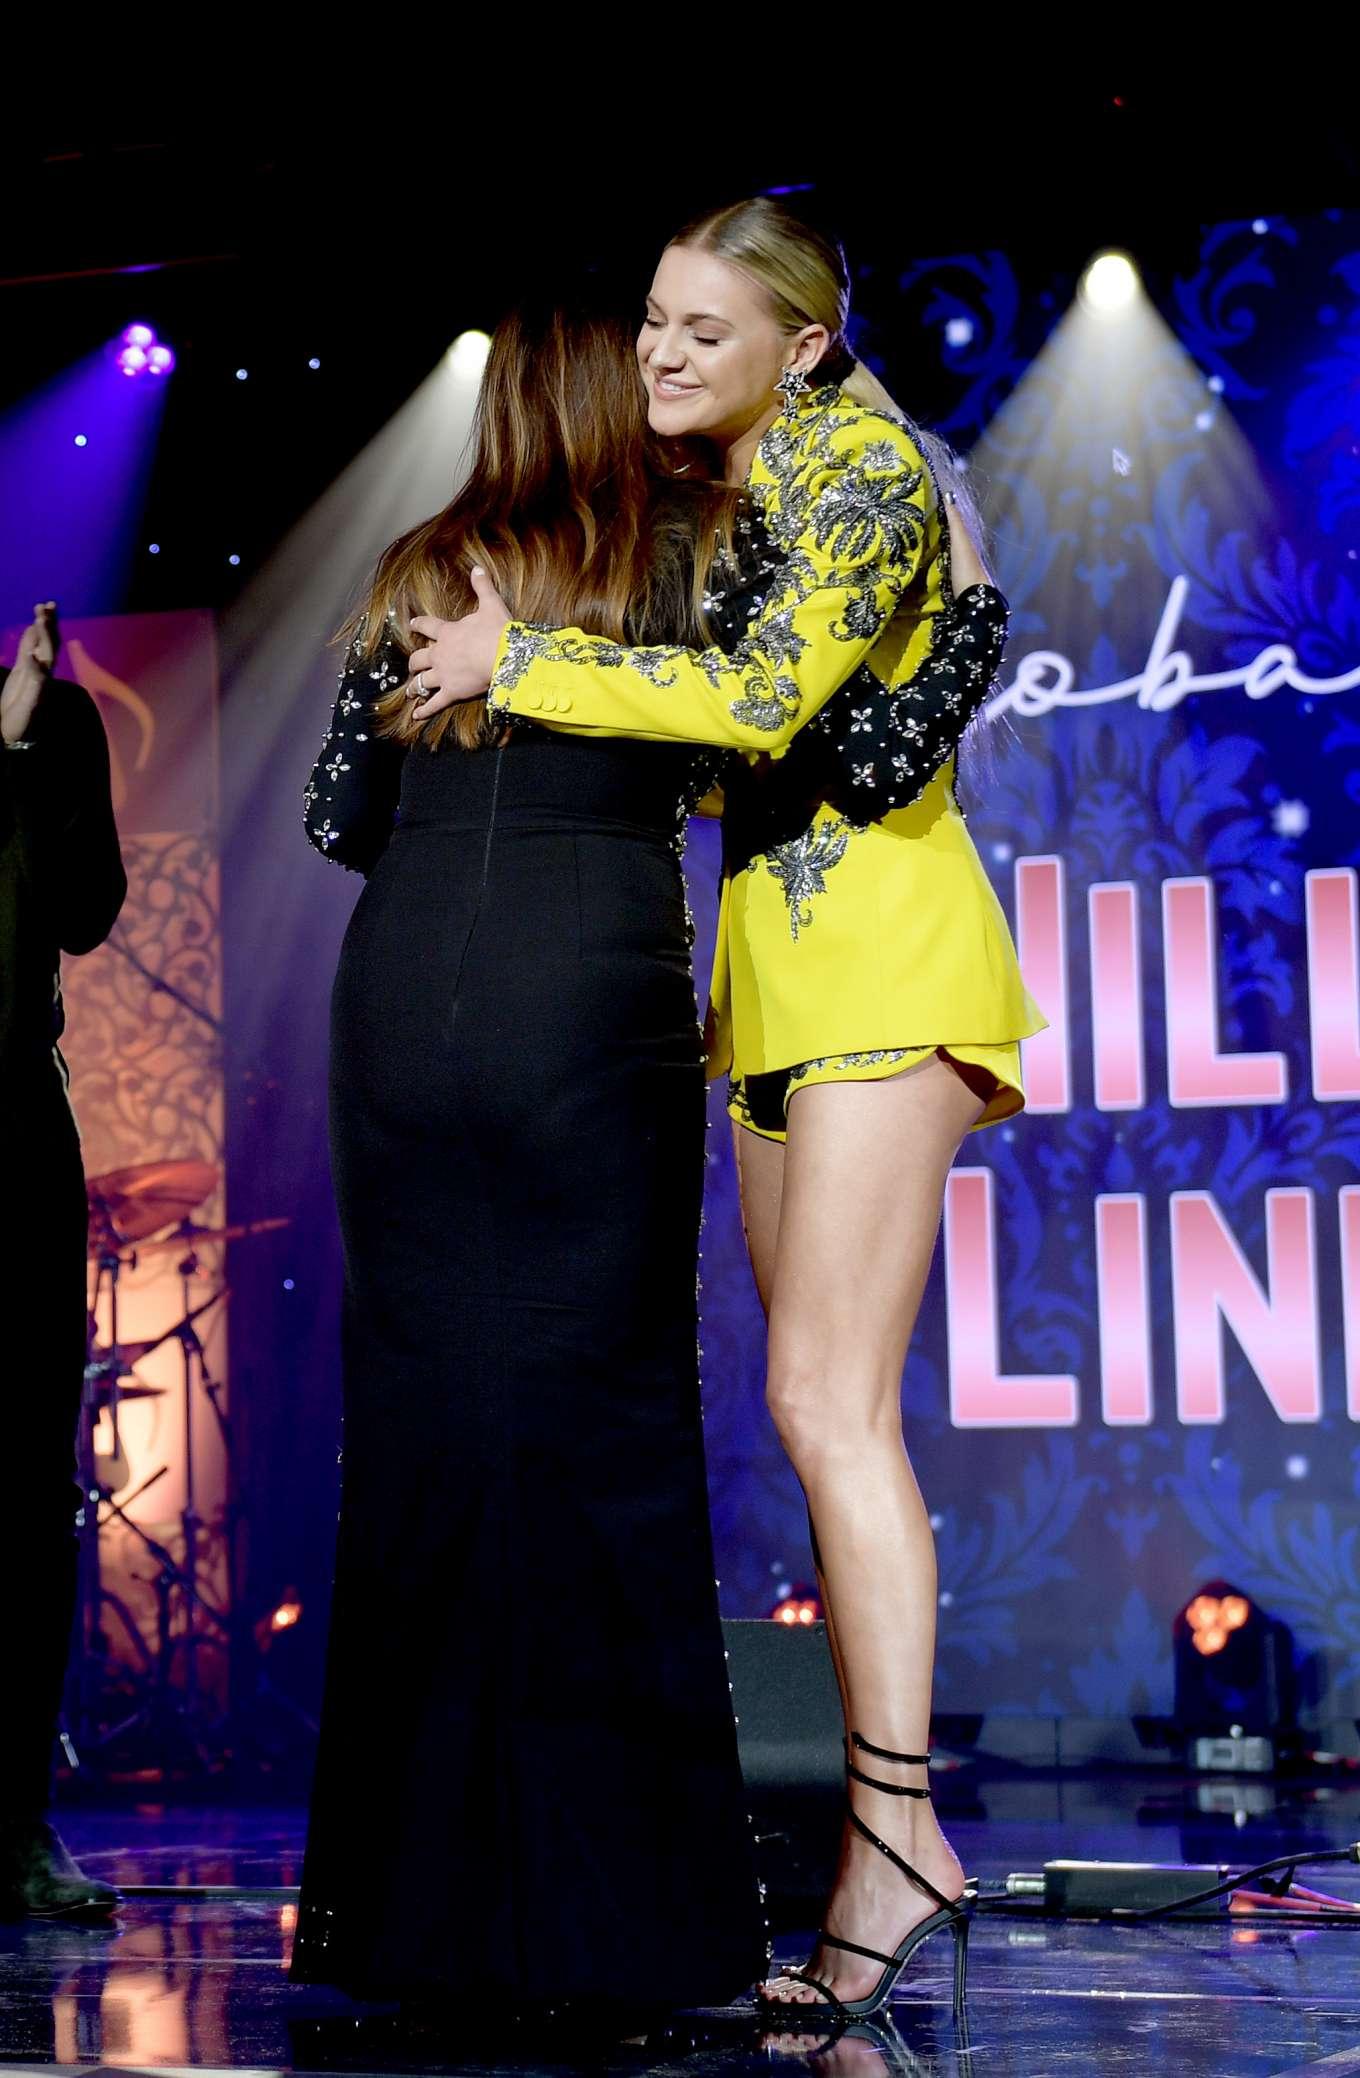 Kelsea Ballerini 2019 : Kelsea Ballerini – 57th Annual ASCAP Country Music Awards-04